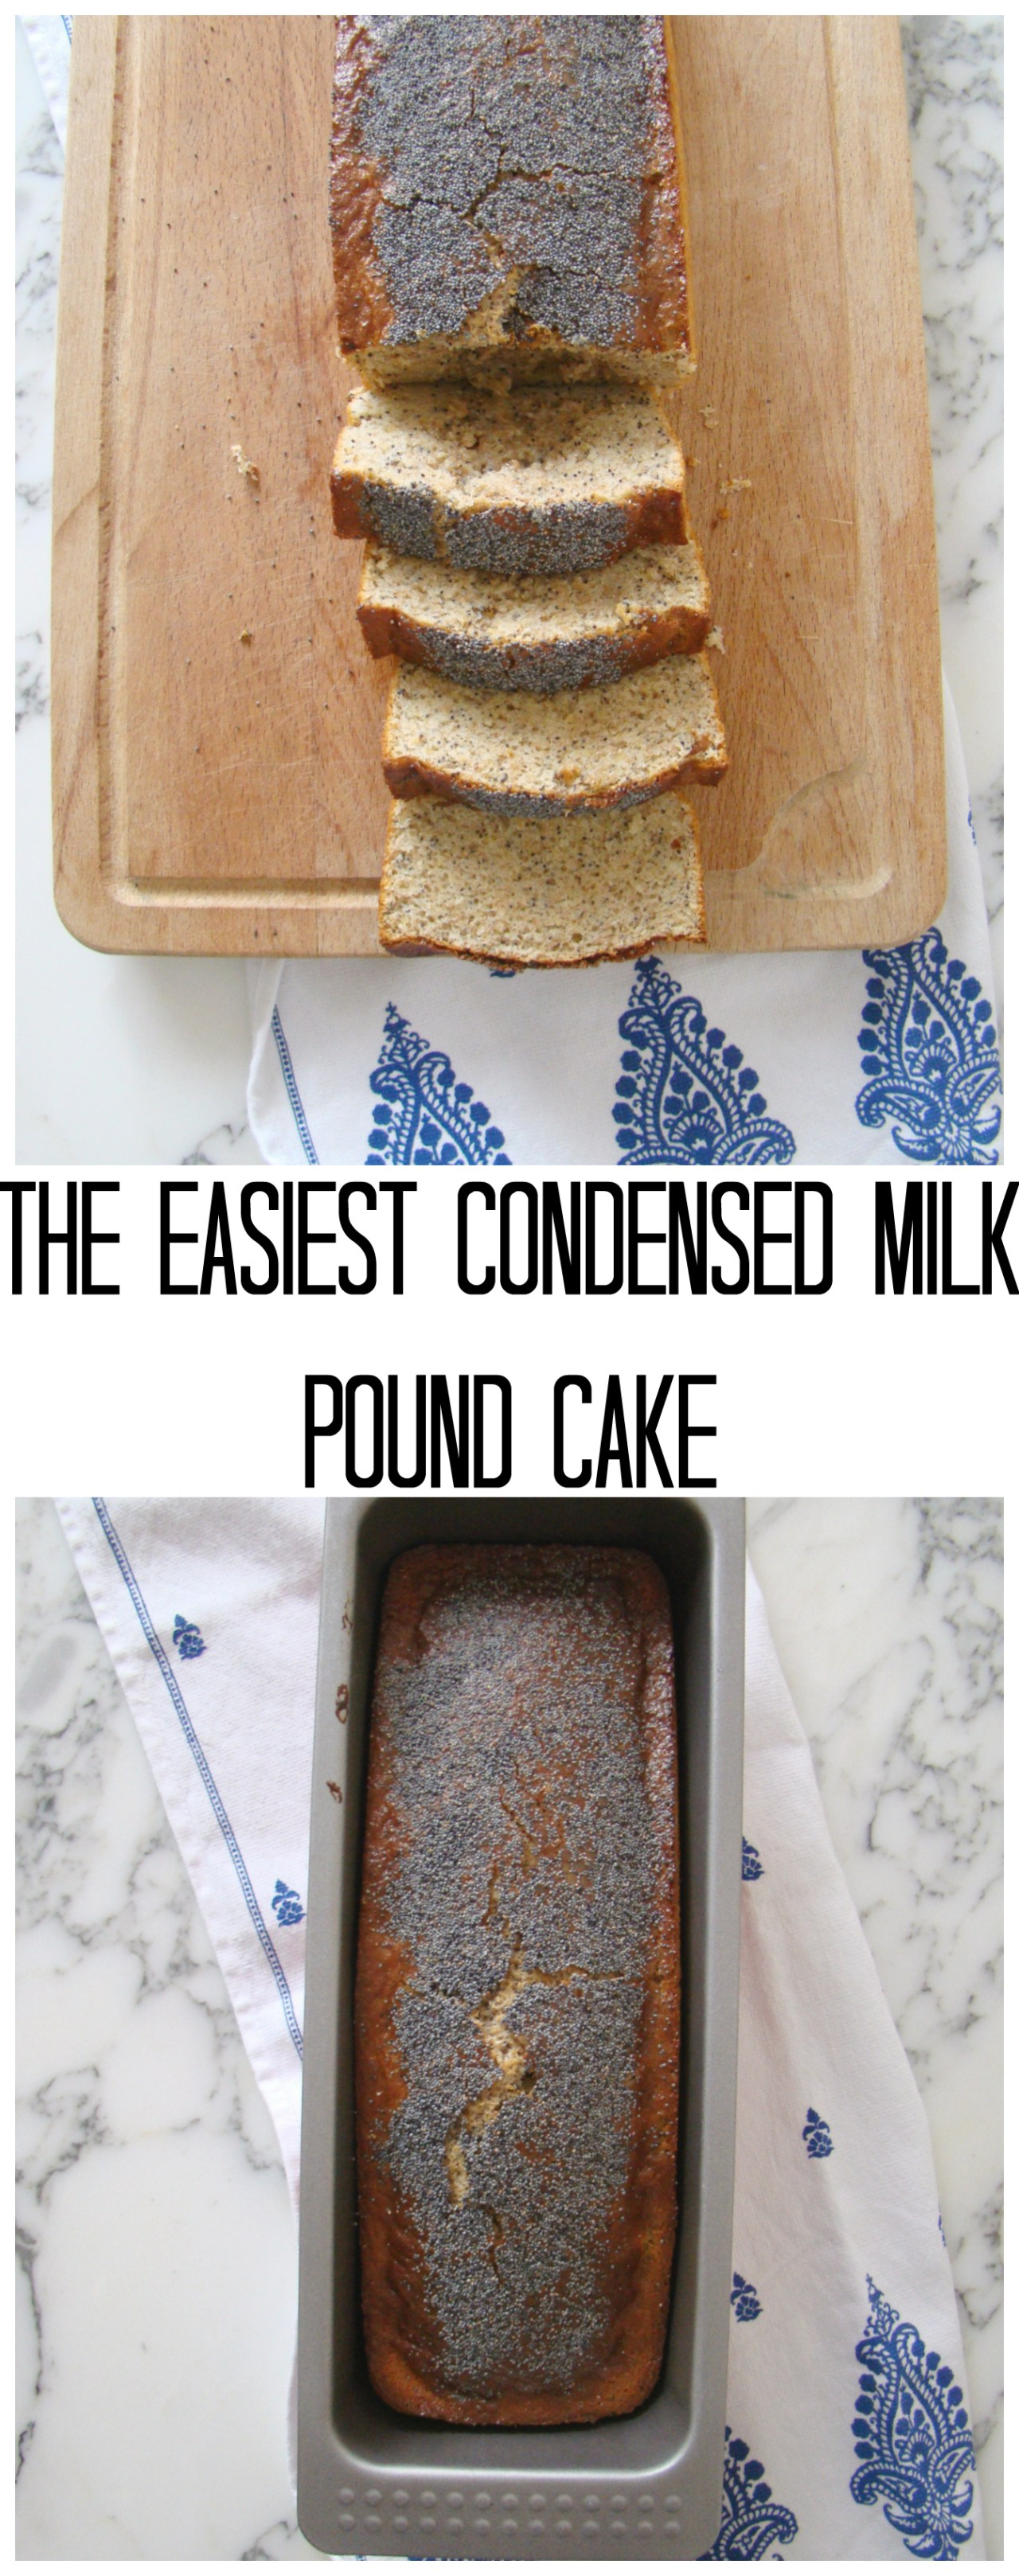 The Easiest Condensed Milk Pound Cake